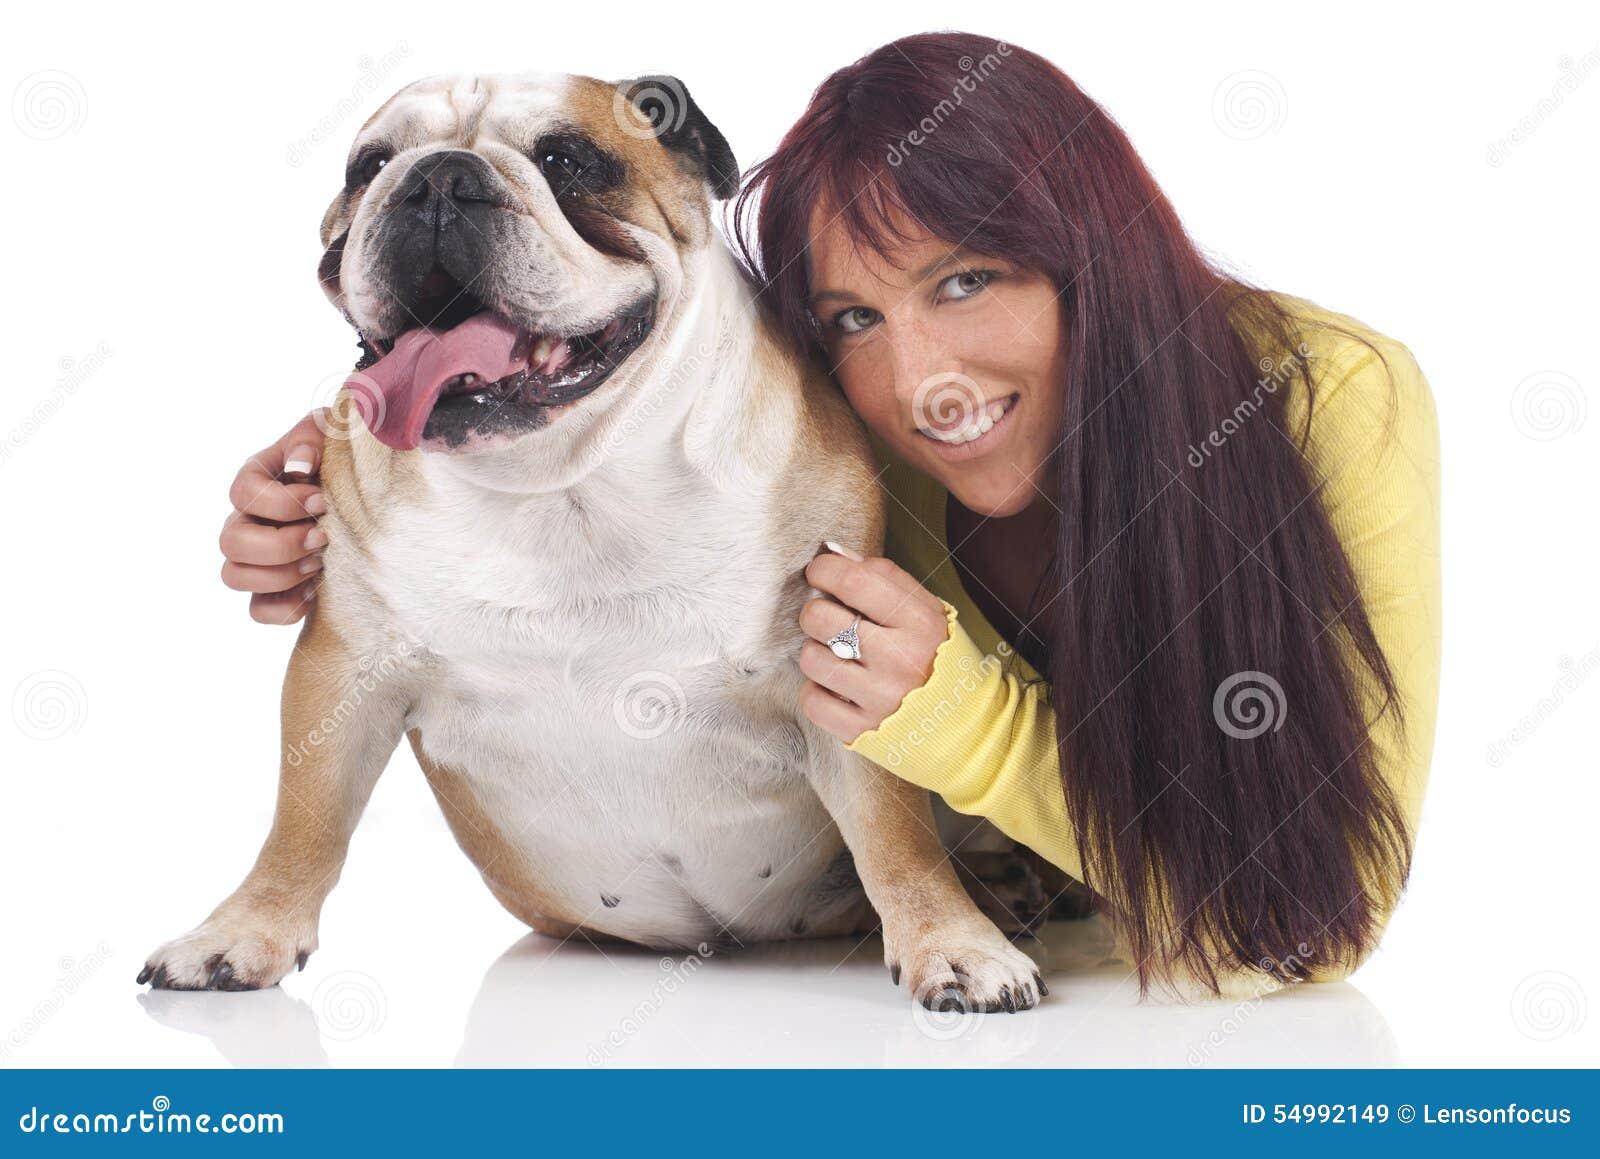 Young woman hugs english bulldog